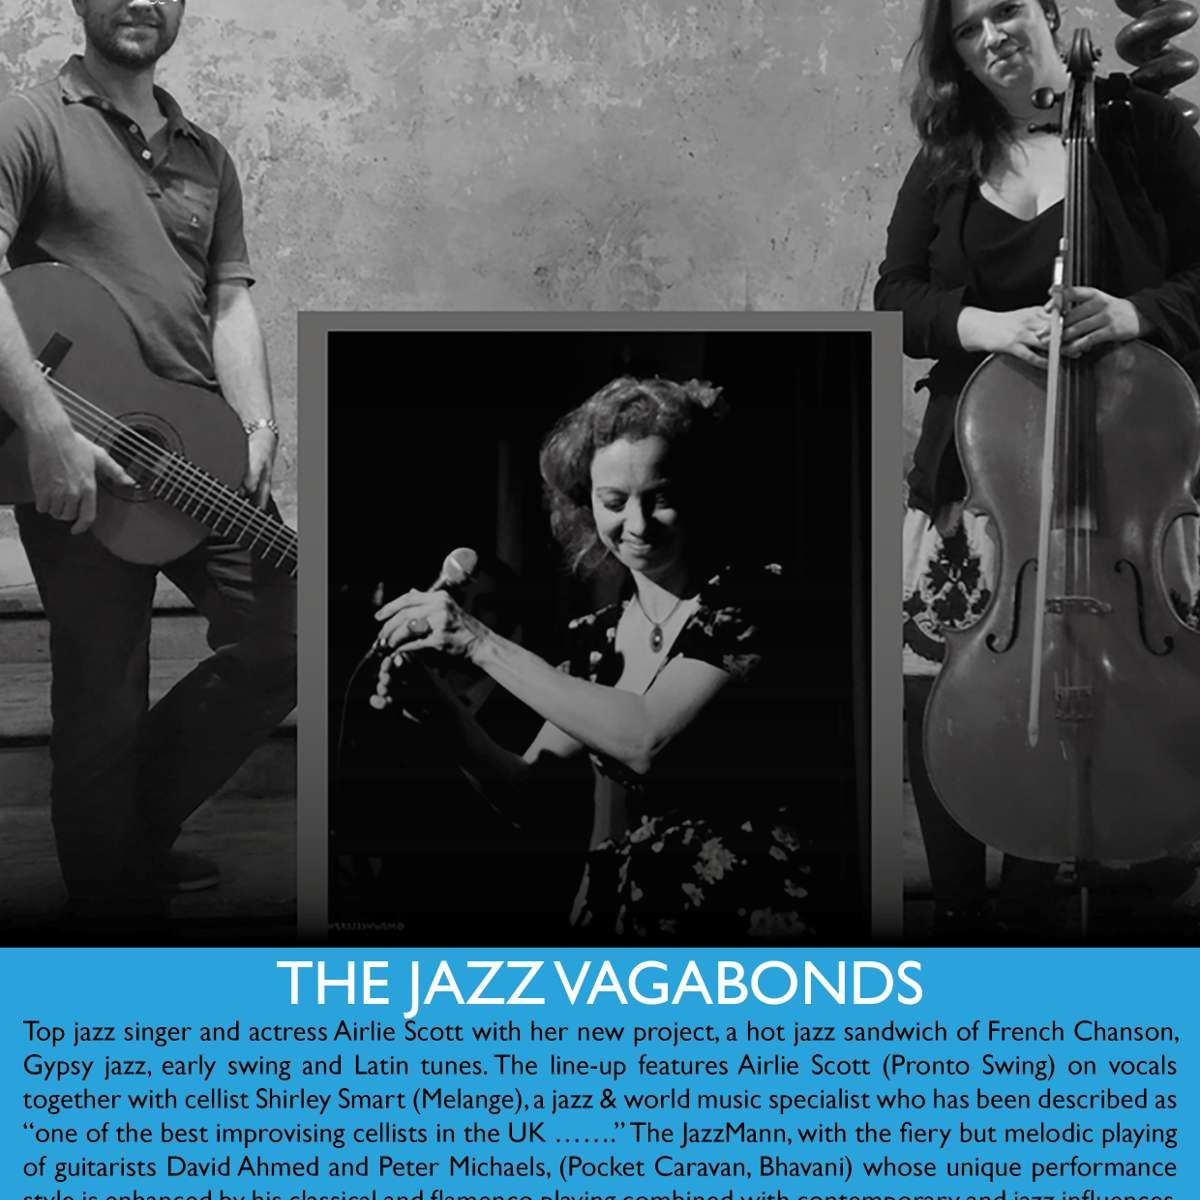 The Jazz Vagabonds at Bulls Head Barnes, London on 01 Nov 2018